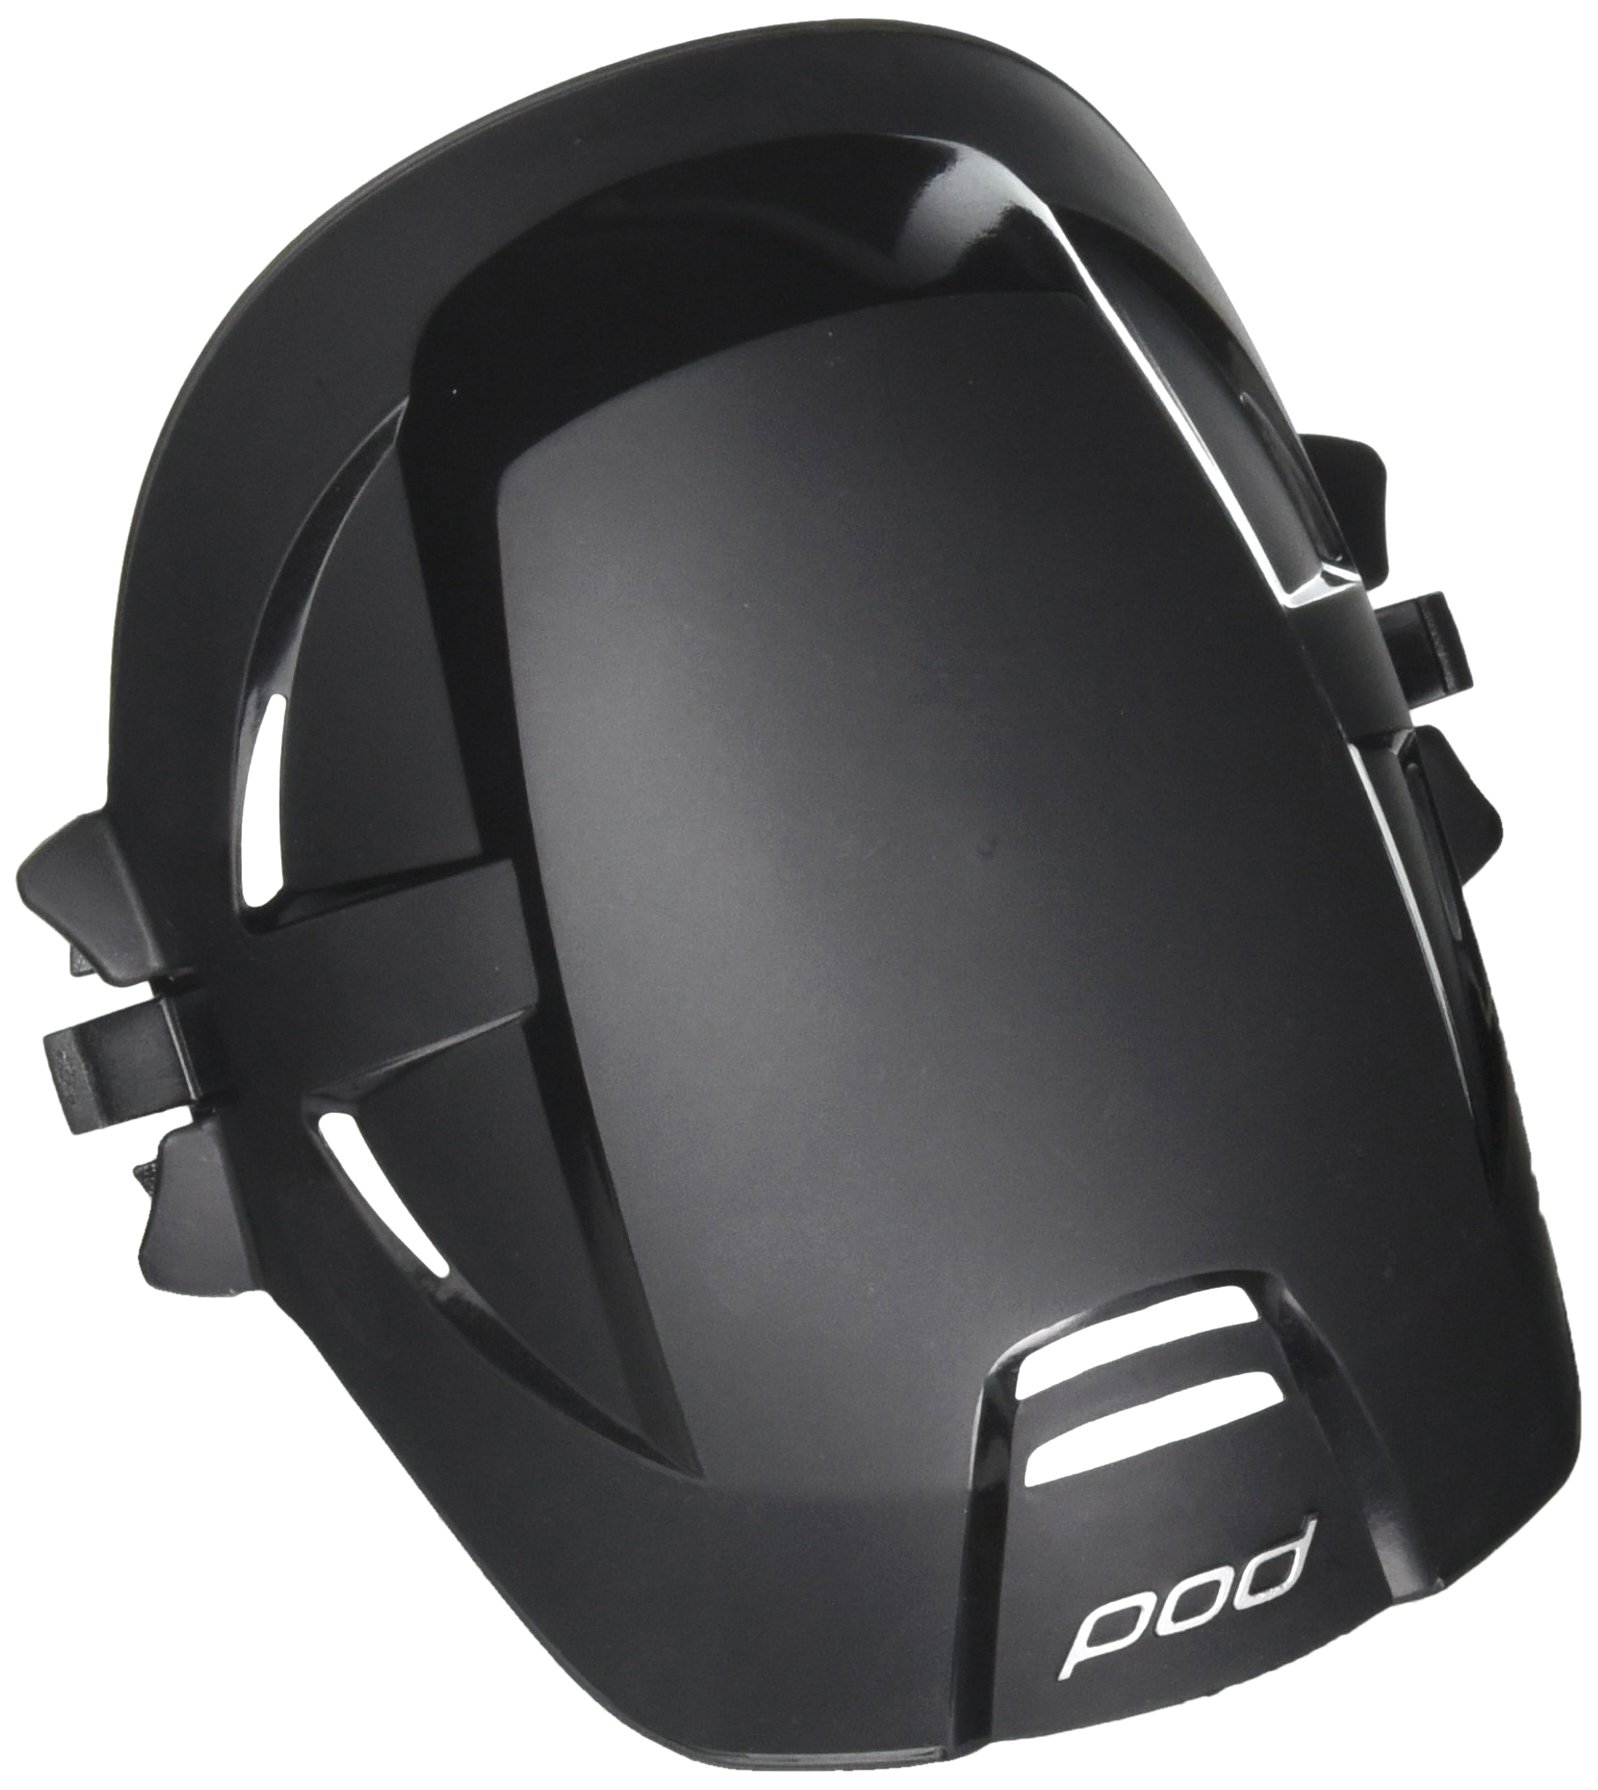 POD KP200-001-LG/XL Unisex-Adult Knee Brace (Black, Large/X-Large)